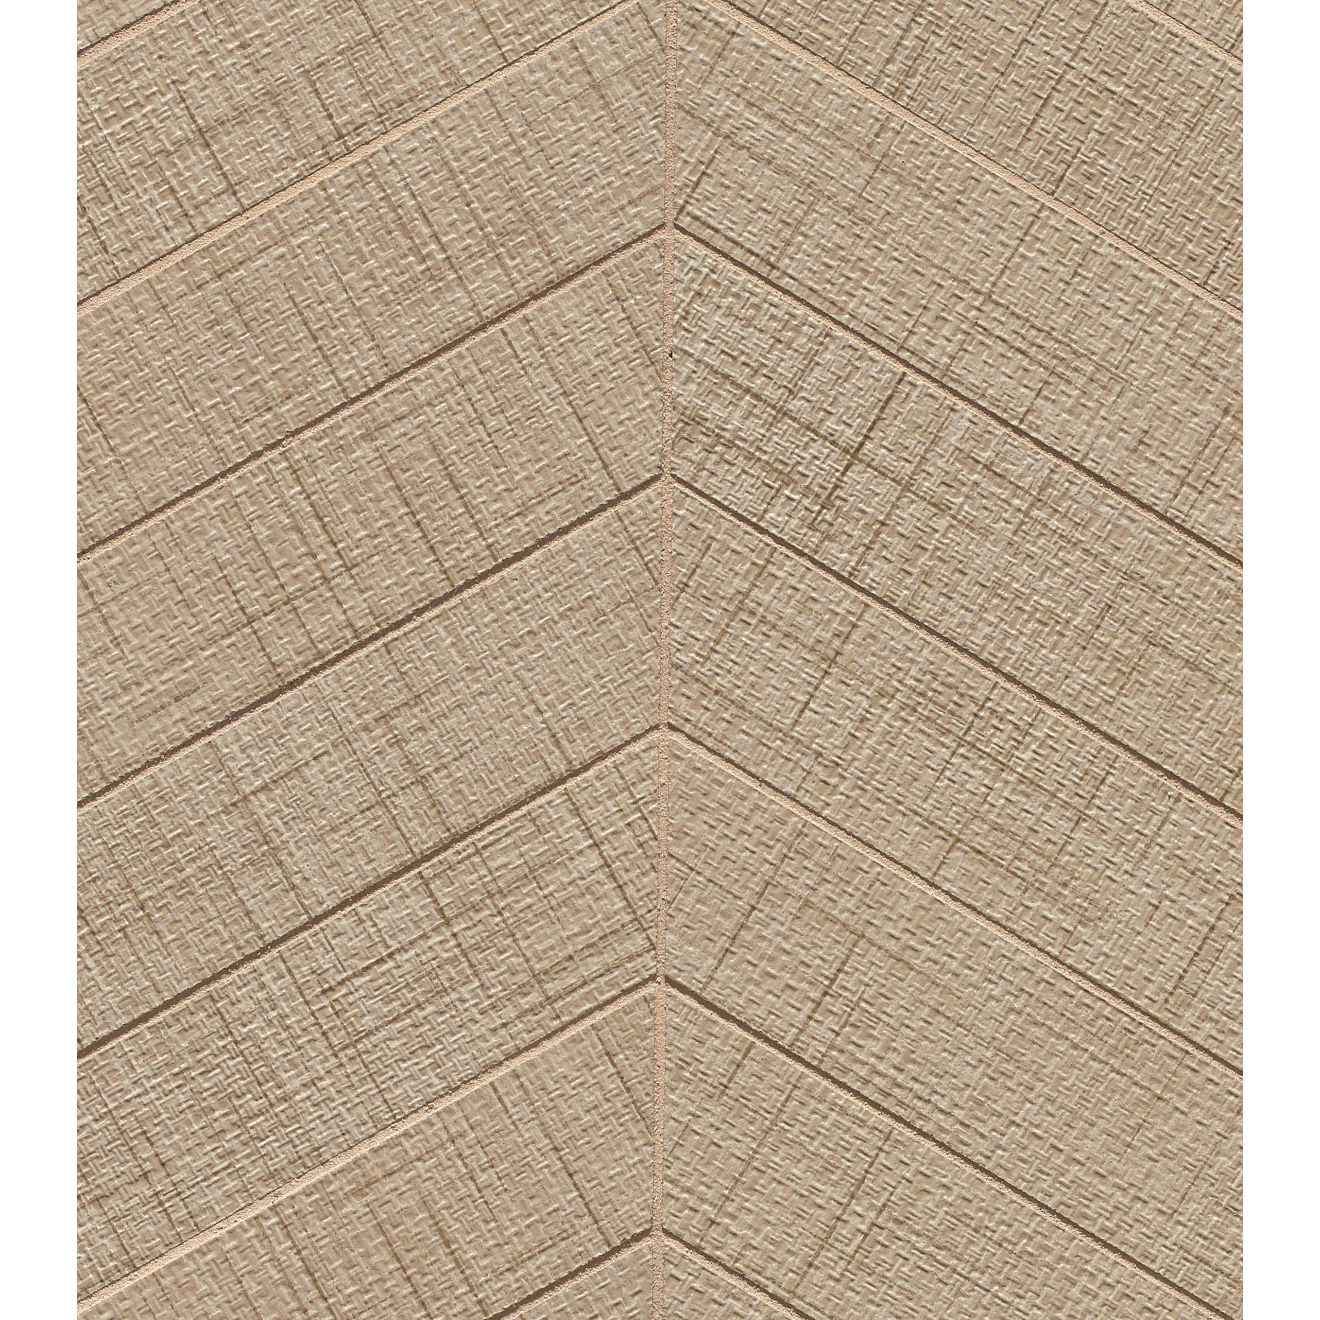 "Lido 2"" x 6"" Floor & Wall Mosaic in Camel"